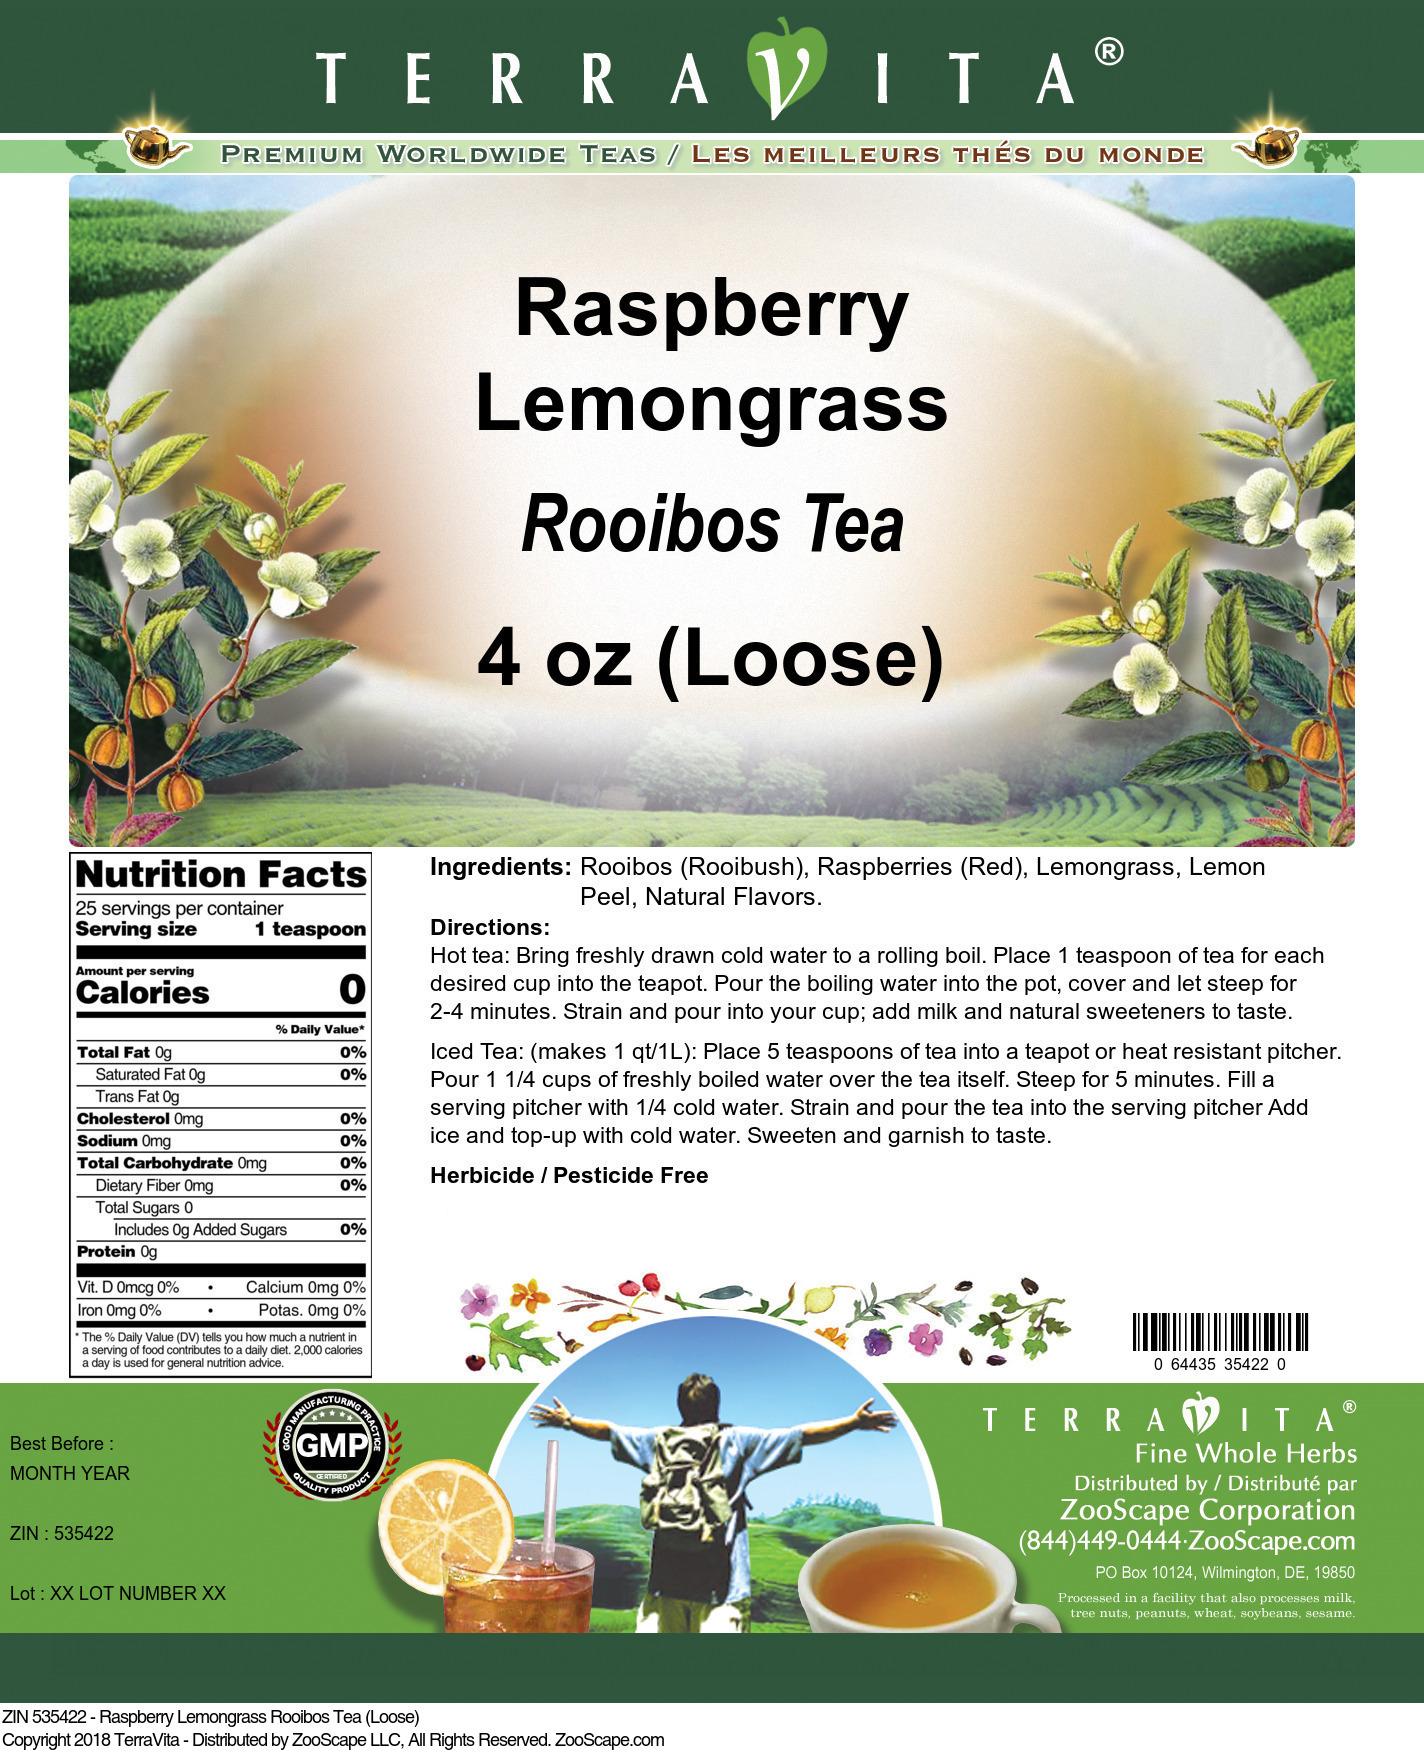 Raspberry Lemongrass Rooibos Tea (Loose)